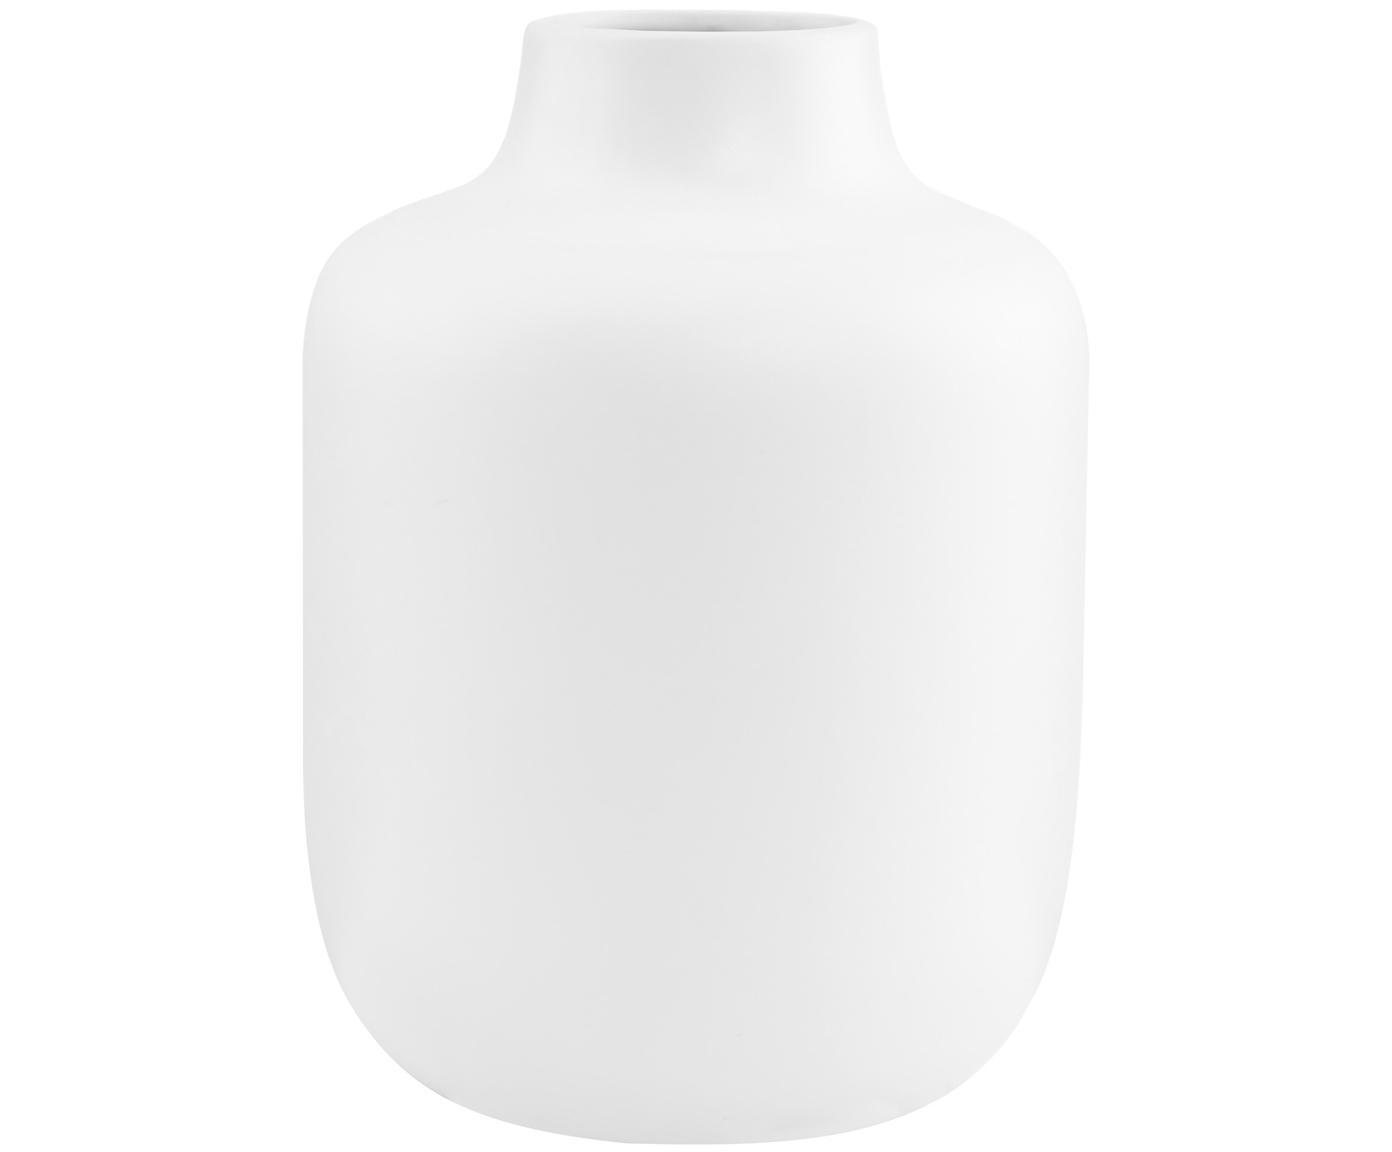 Vaso in porcellana Belle Blanc, Porcellana, Bianco, Ø 17 x Alt. 20 cm